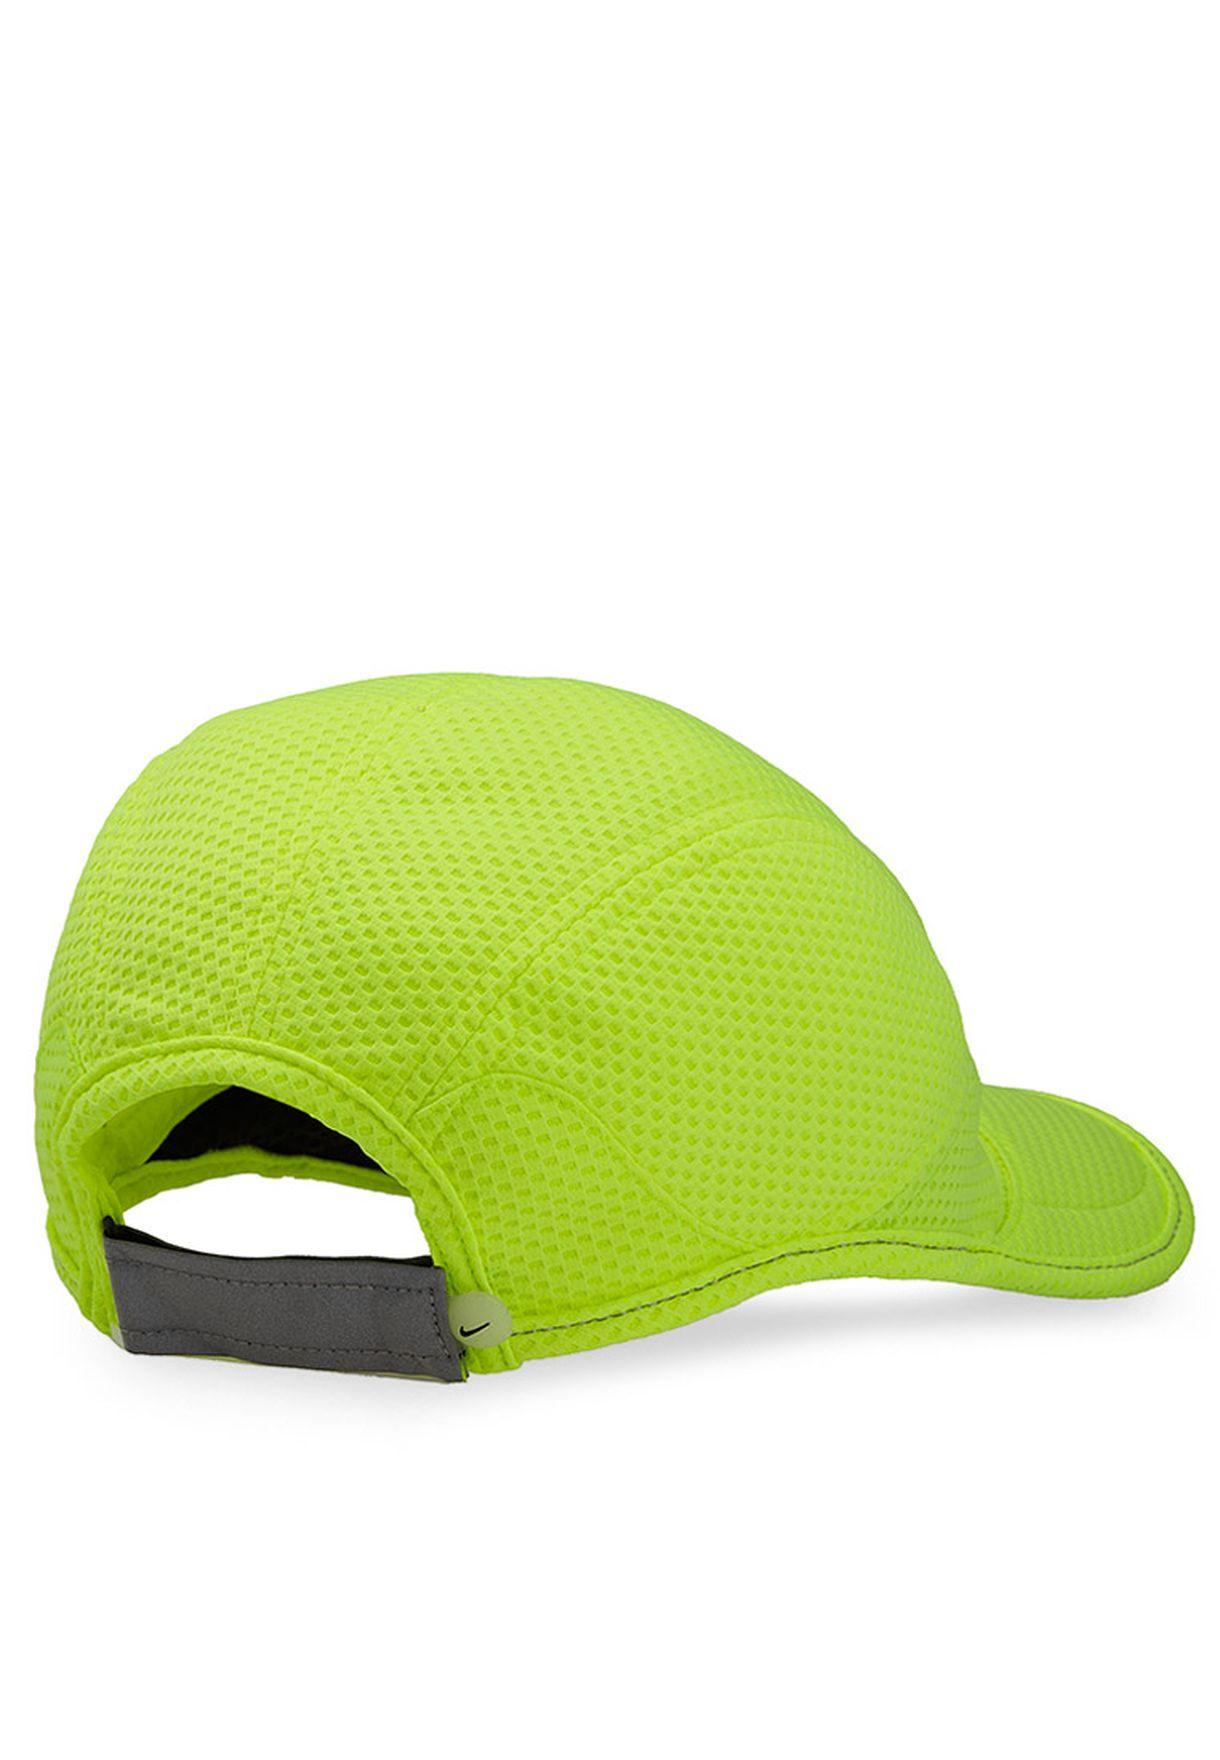 d93a845d4f7 Shop Nike yellow Mesh Daybreak Cap NKAP520787-712 for Men in ...